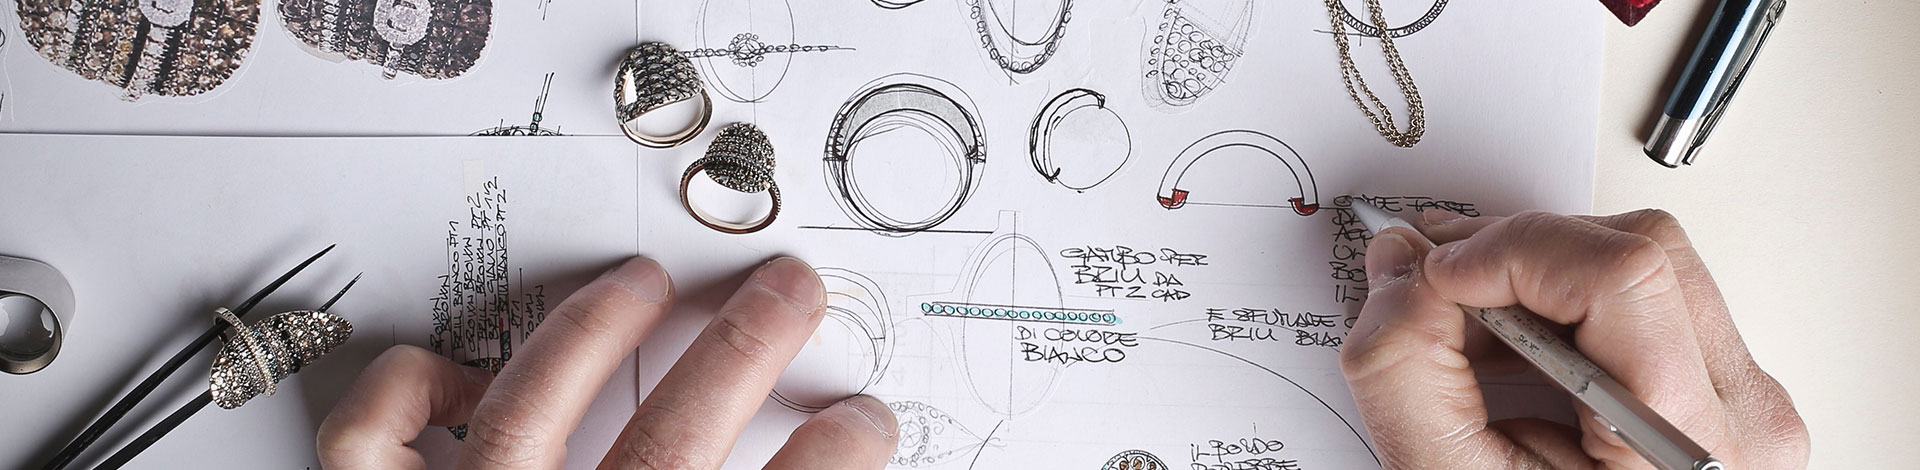 Sieraden laten maken | Goud & diamanten | Premium kwaliteit Zazare Diamonds